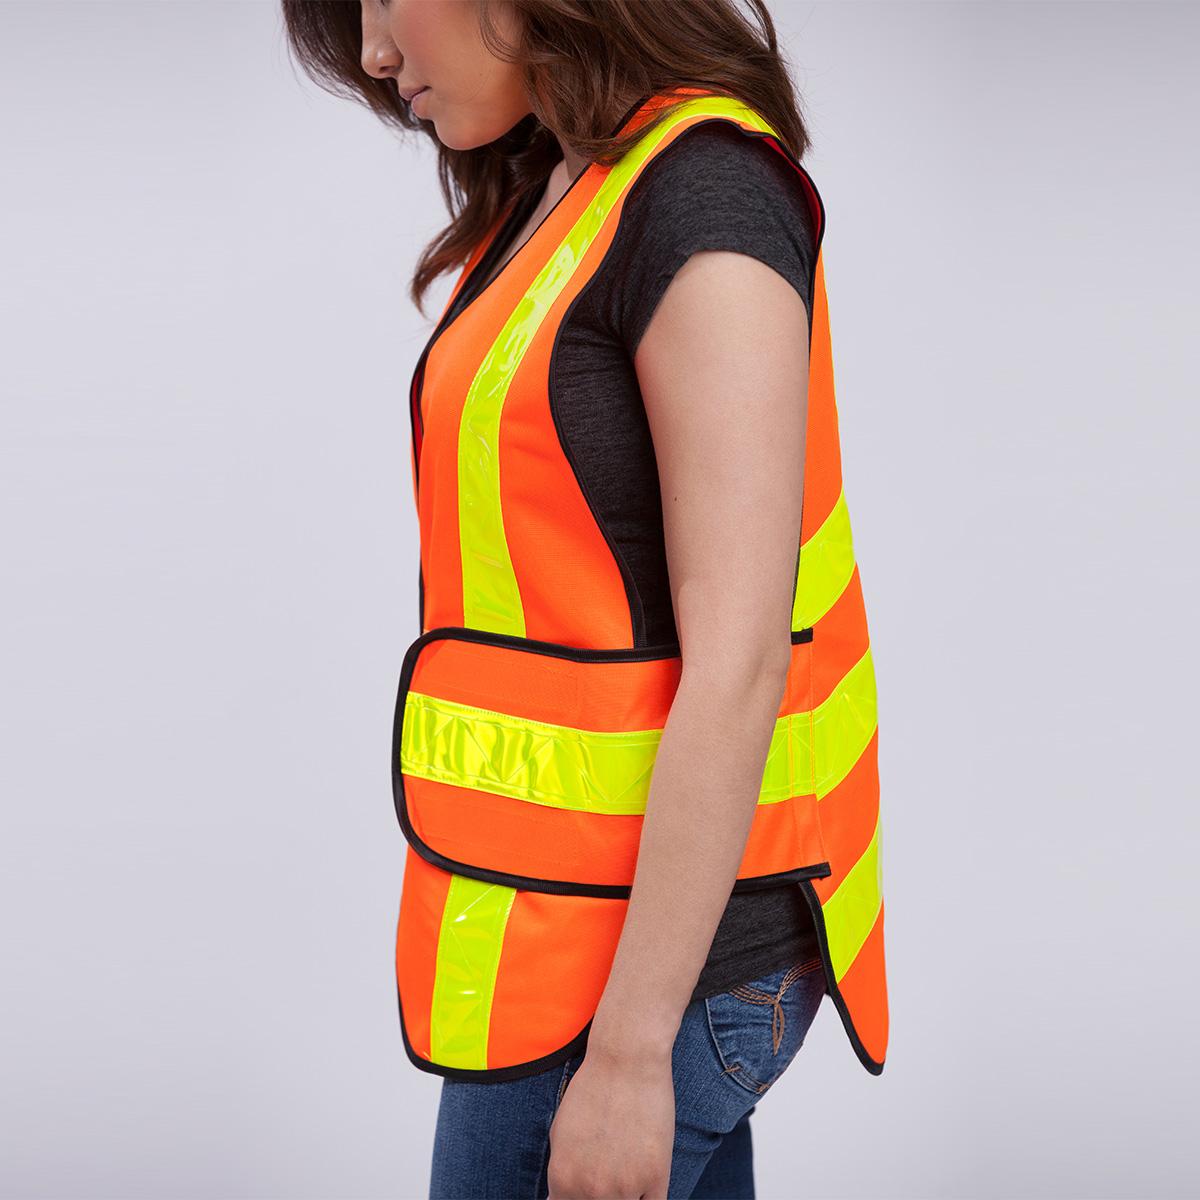 Chevron High Visibility Vest Edgar James Apparel